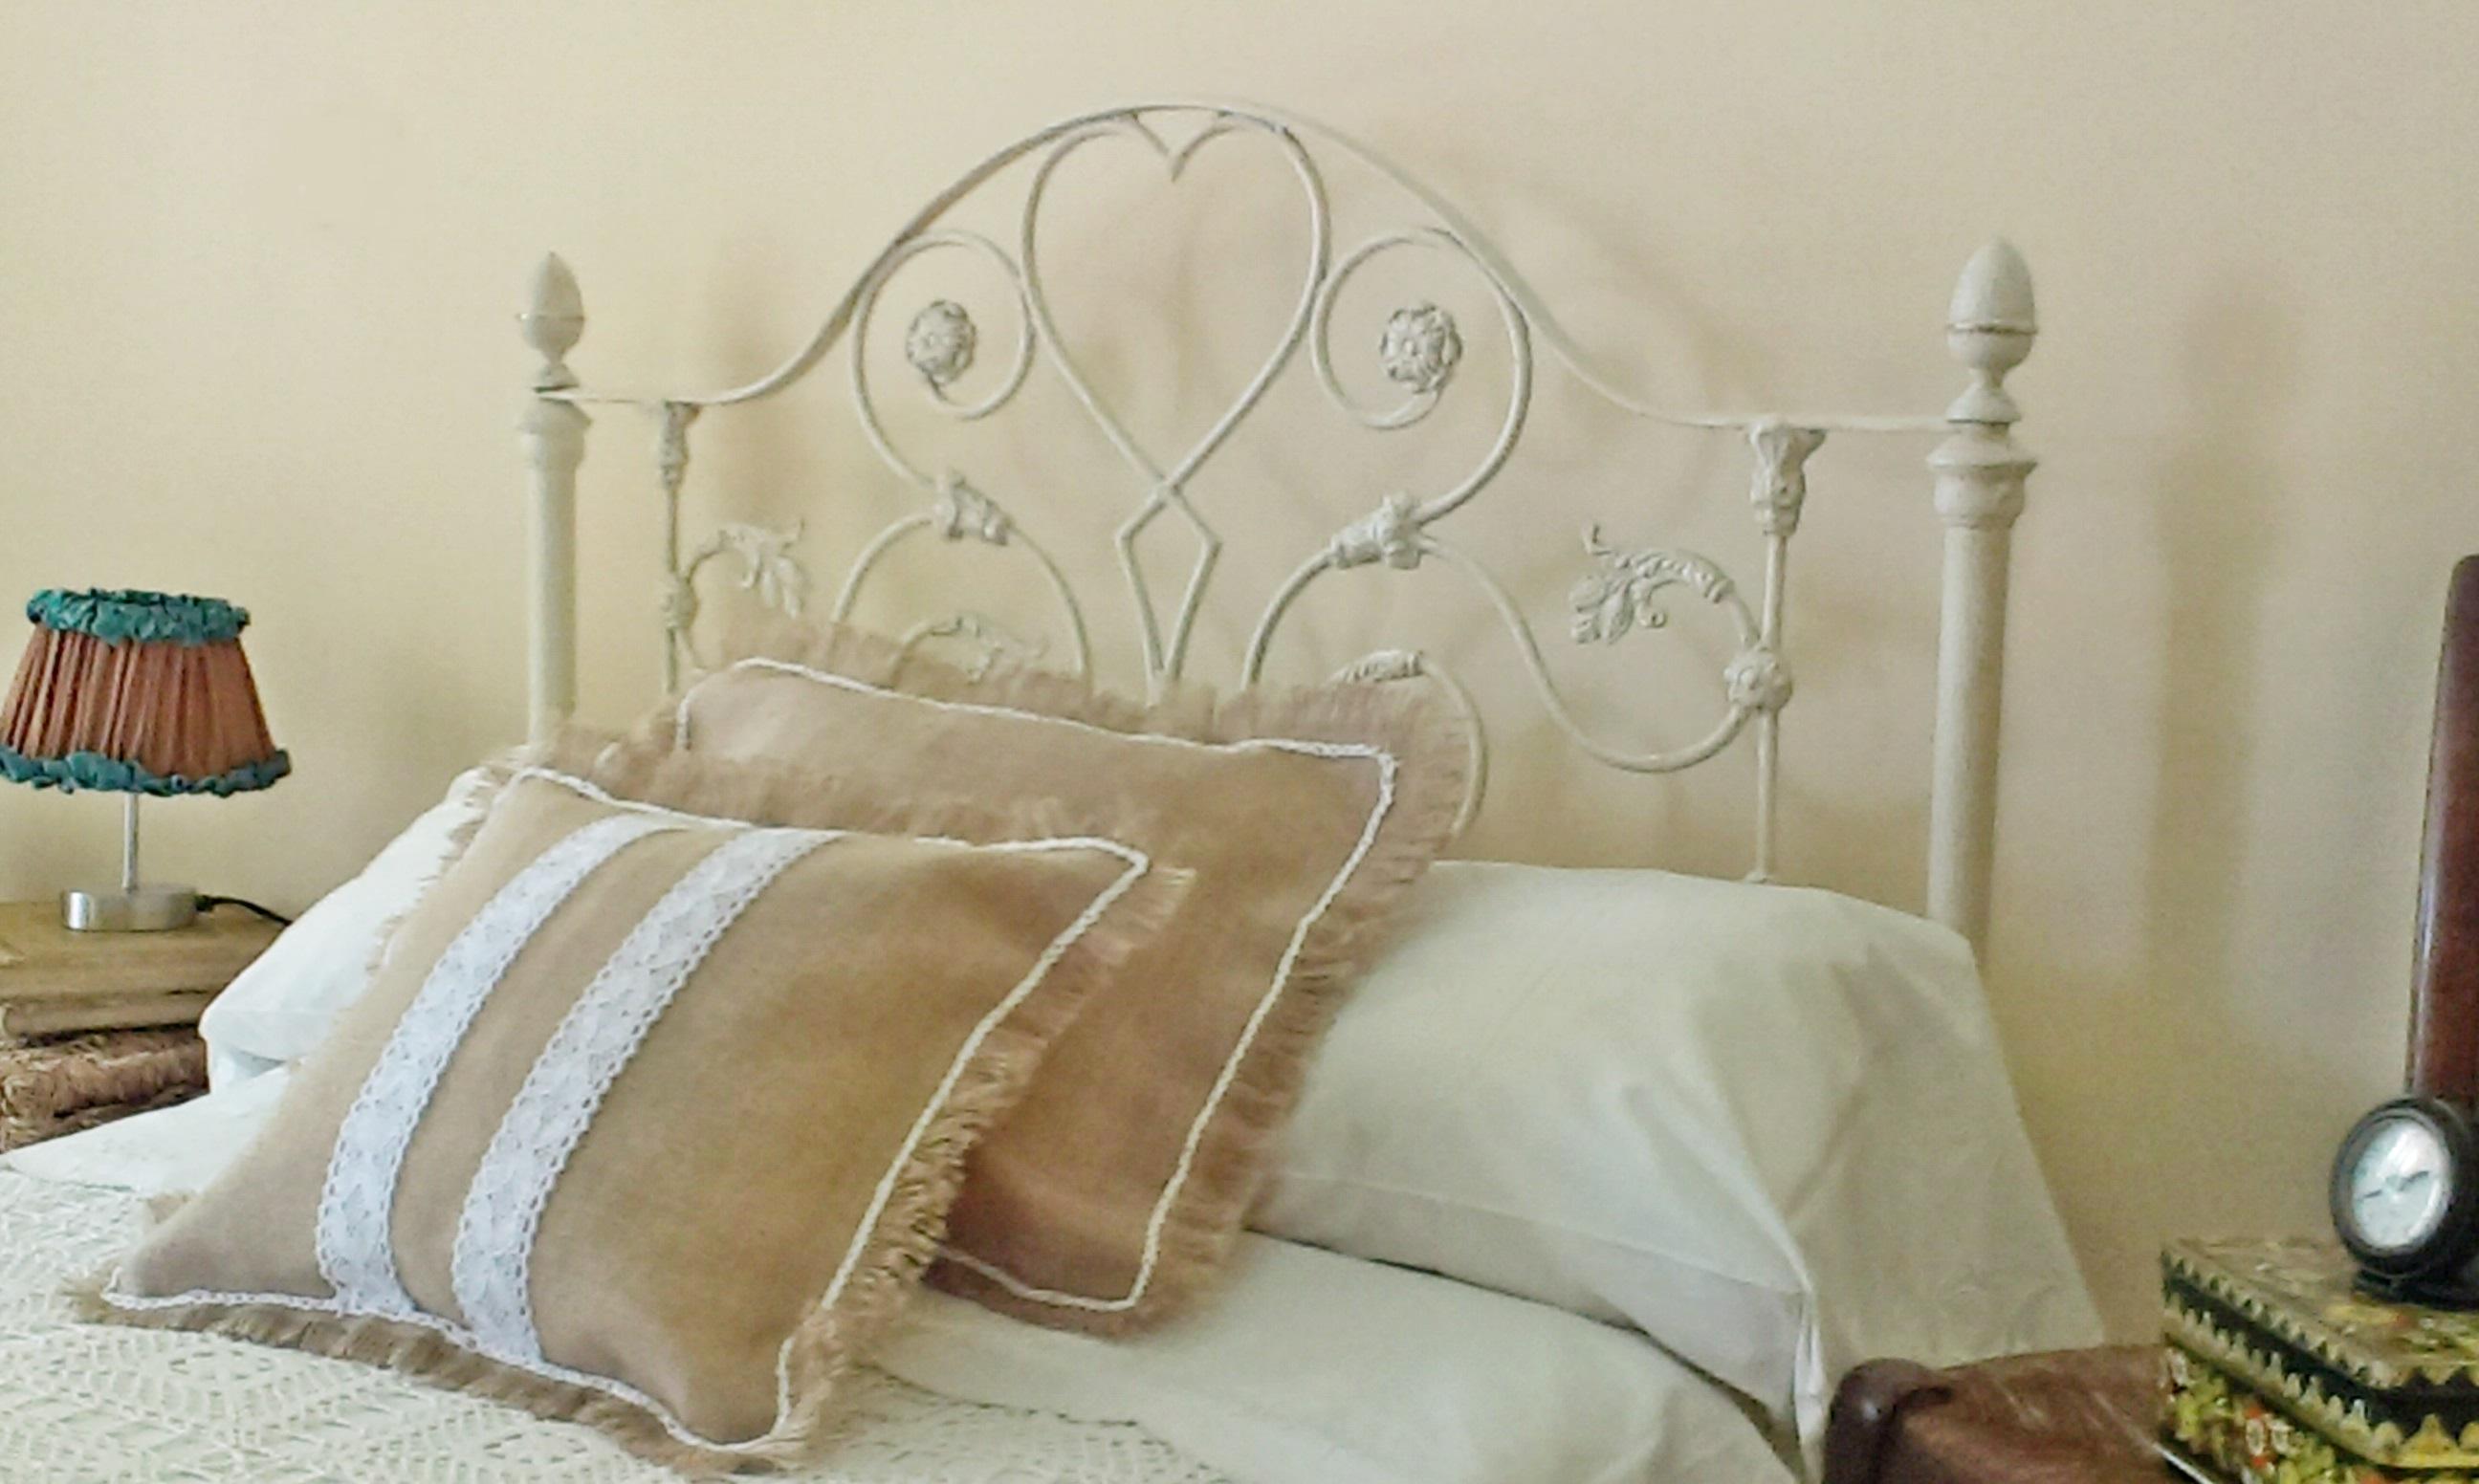 Antigua cama de forja estilo shabby shabby old iron bed - Camas de forja antiguas ...